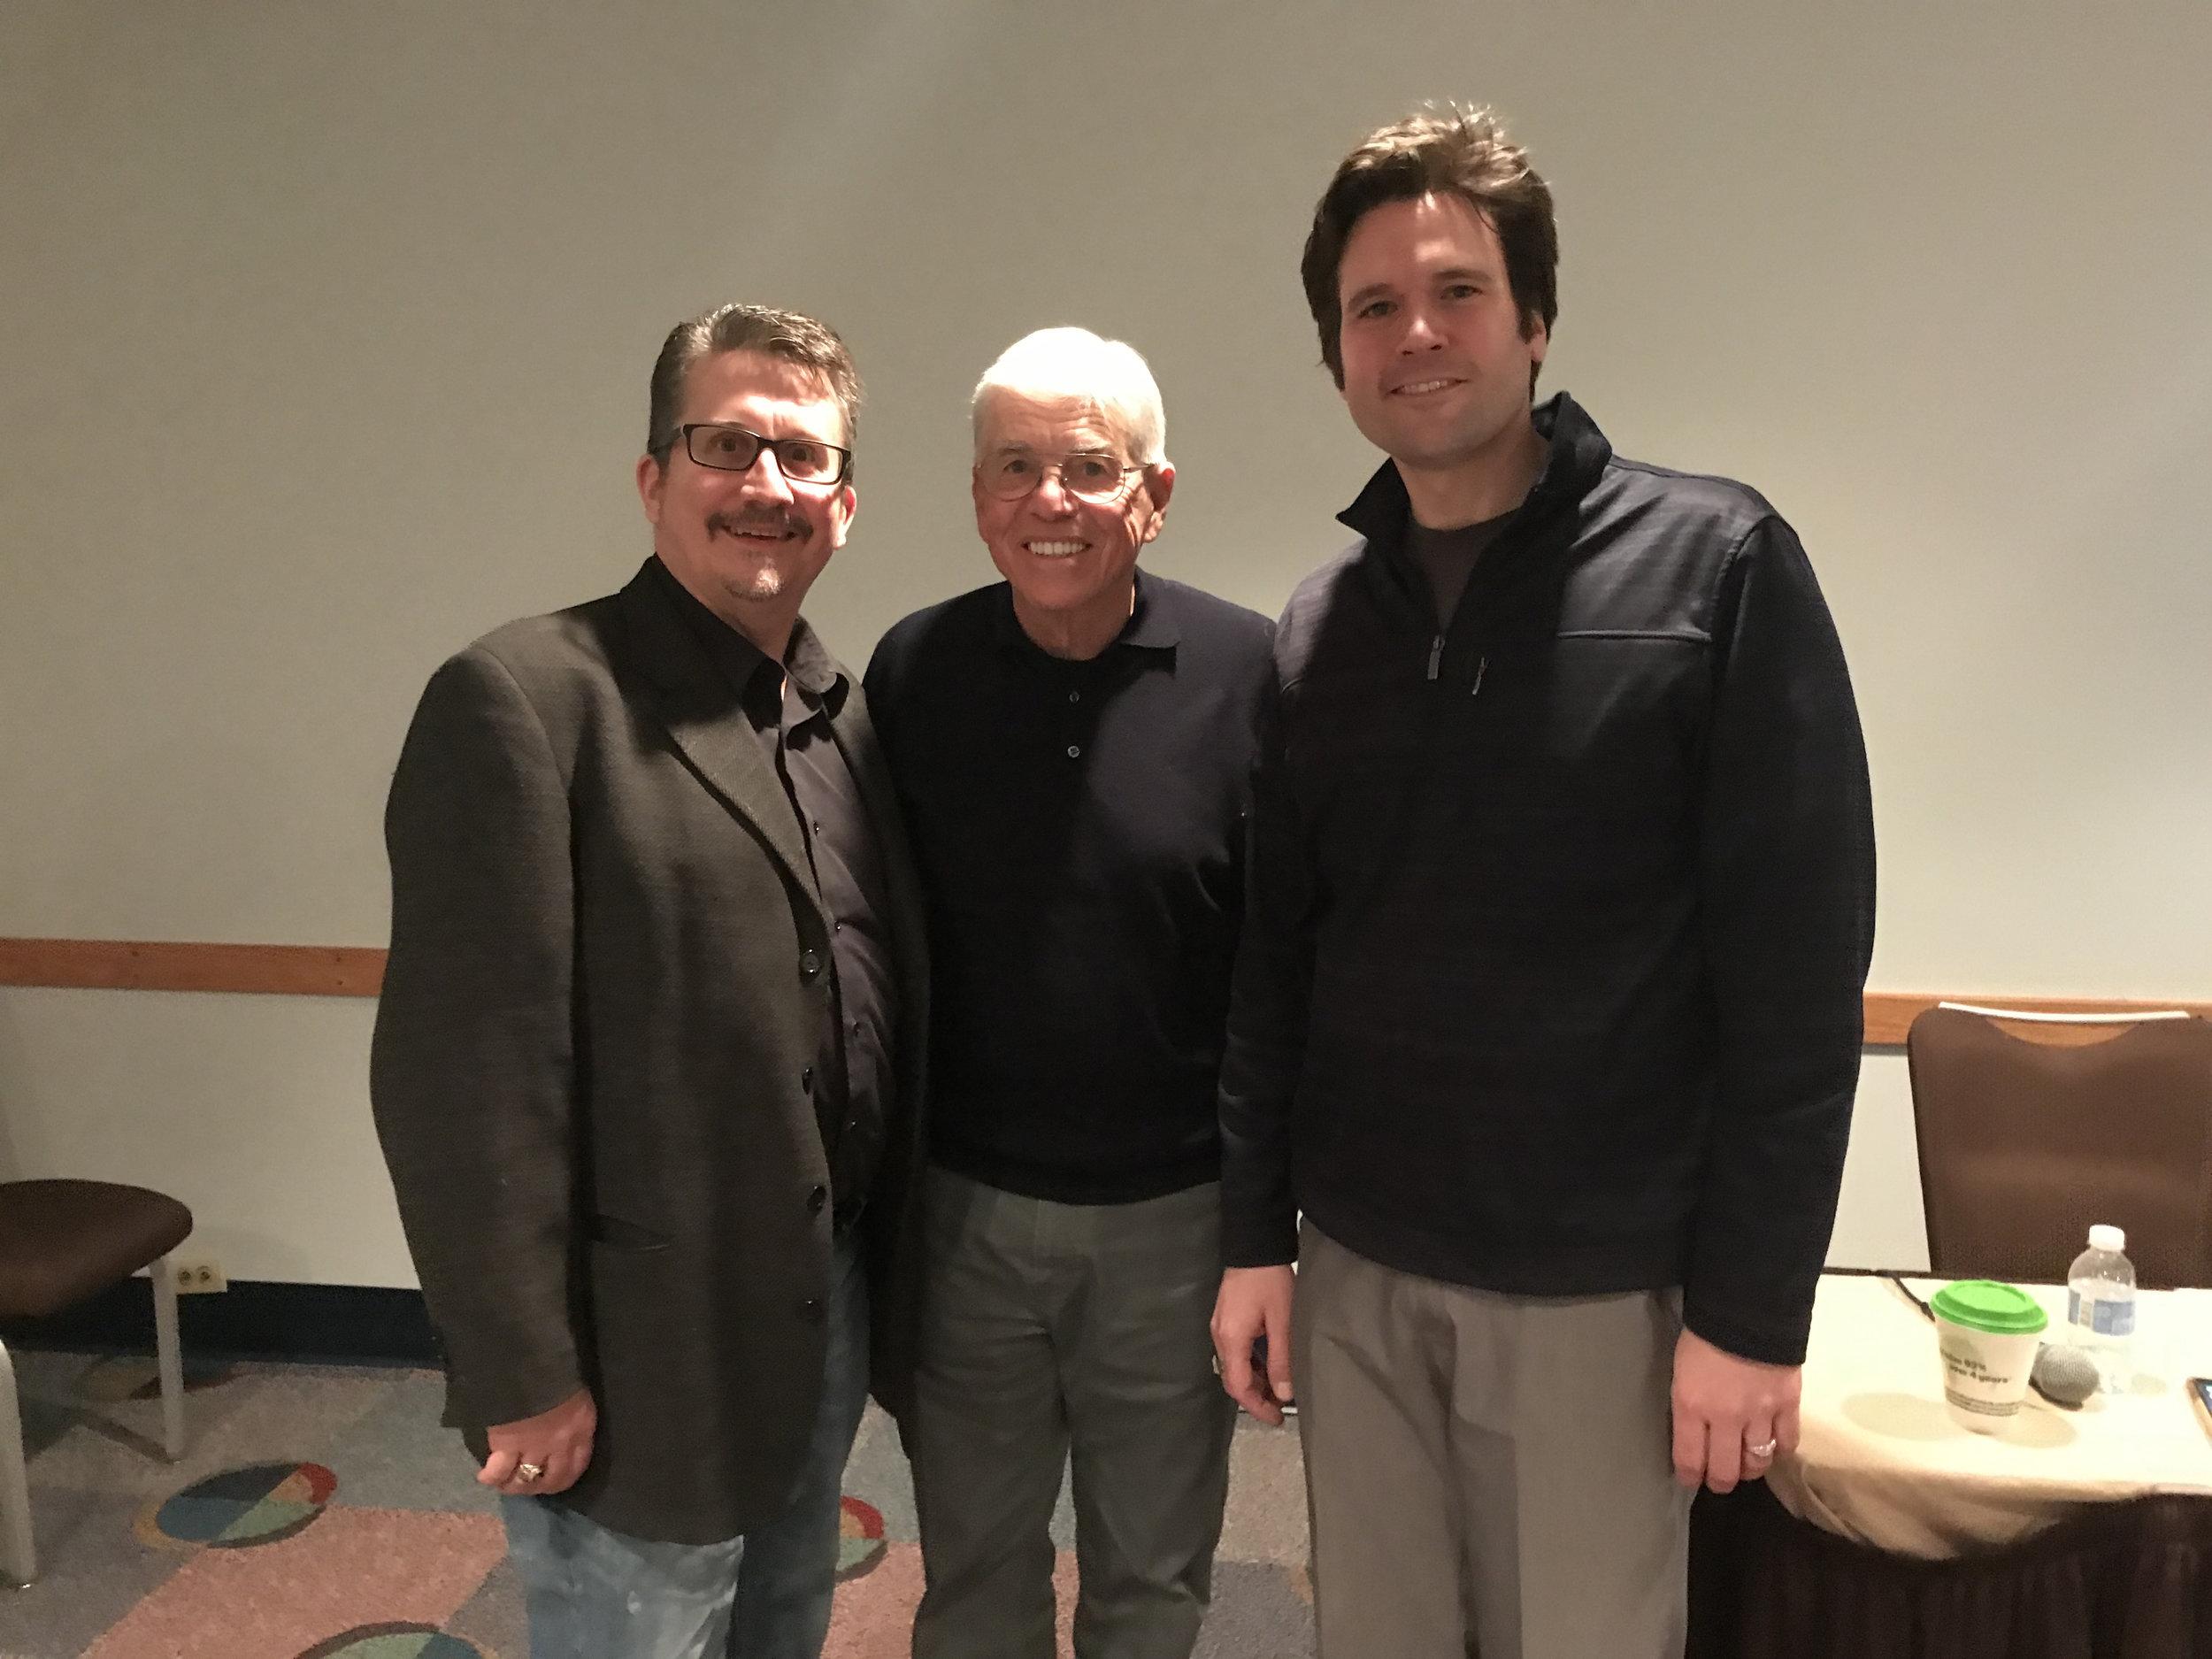 L to R: R. Scott Barnas, James F. Keene, Don Stinson